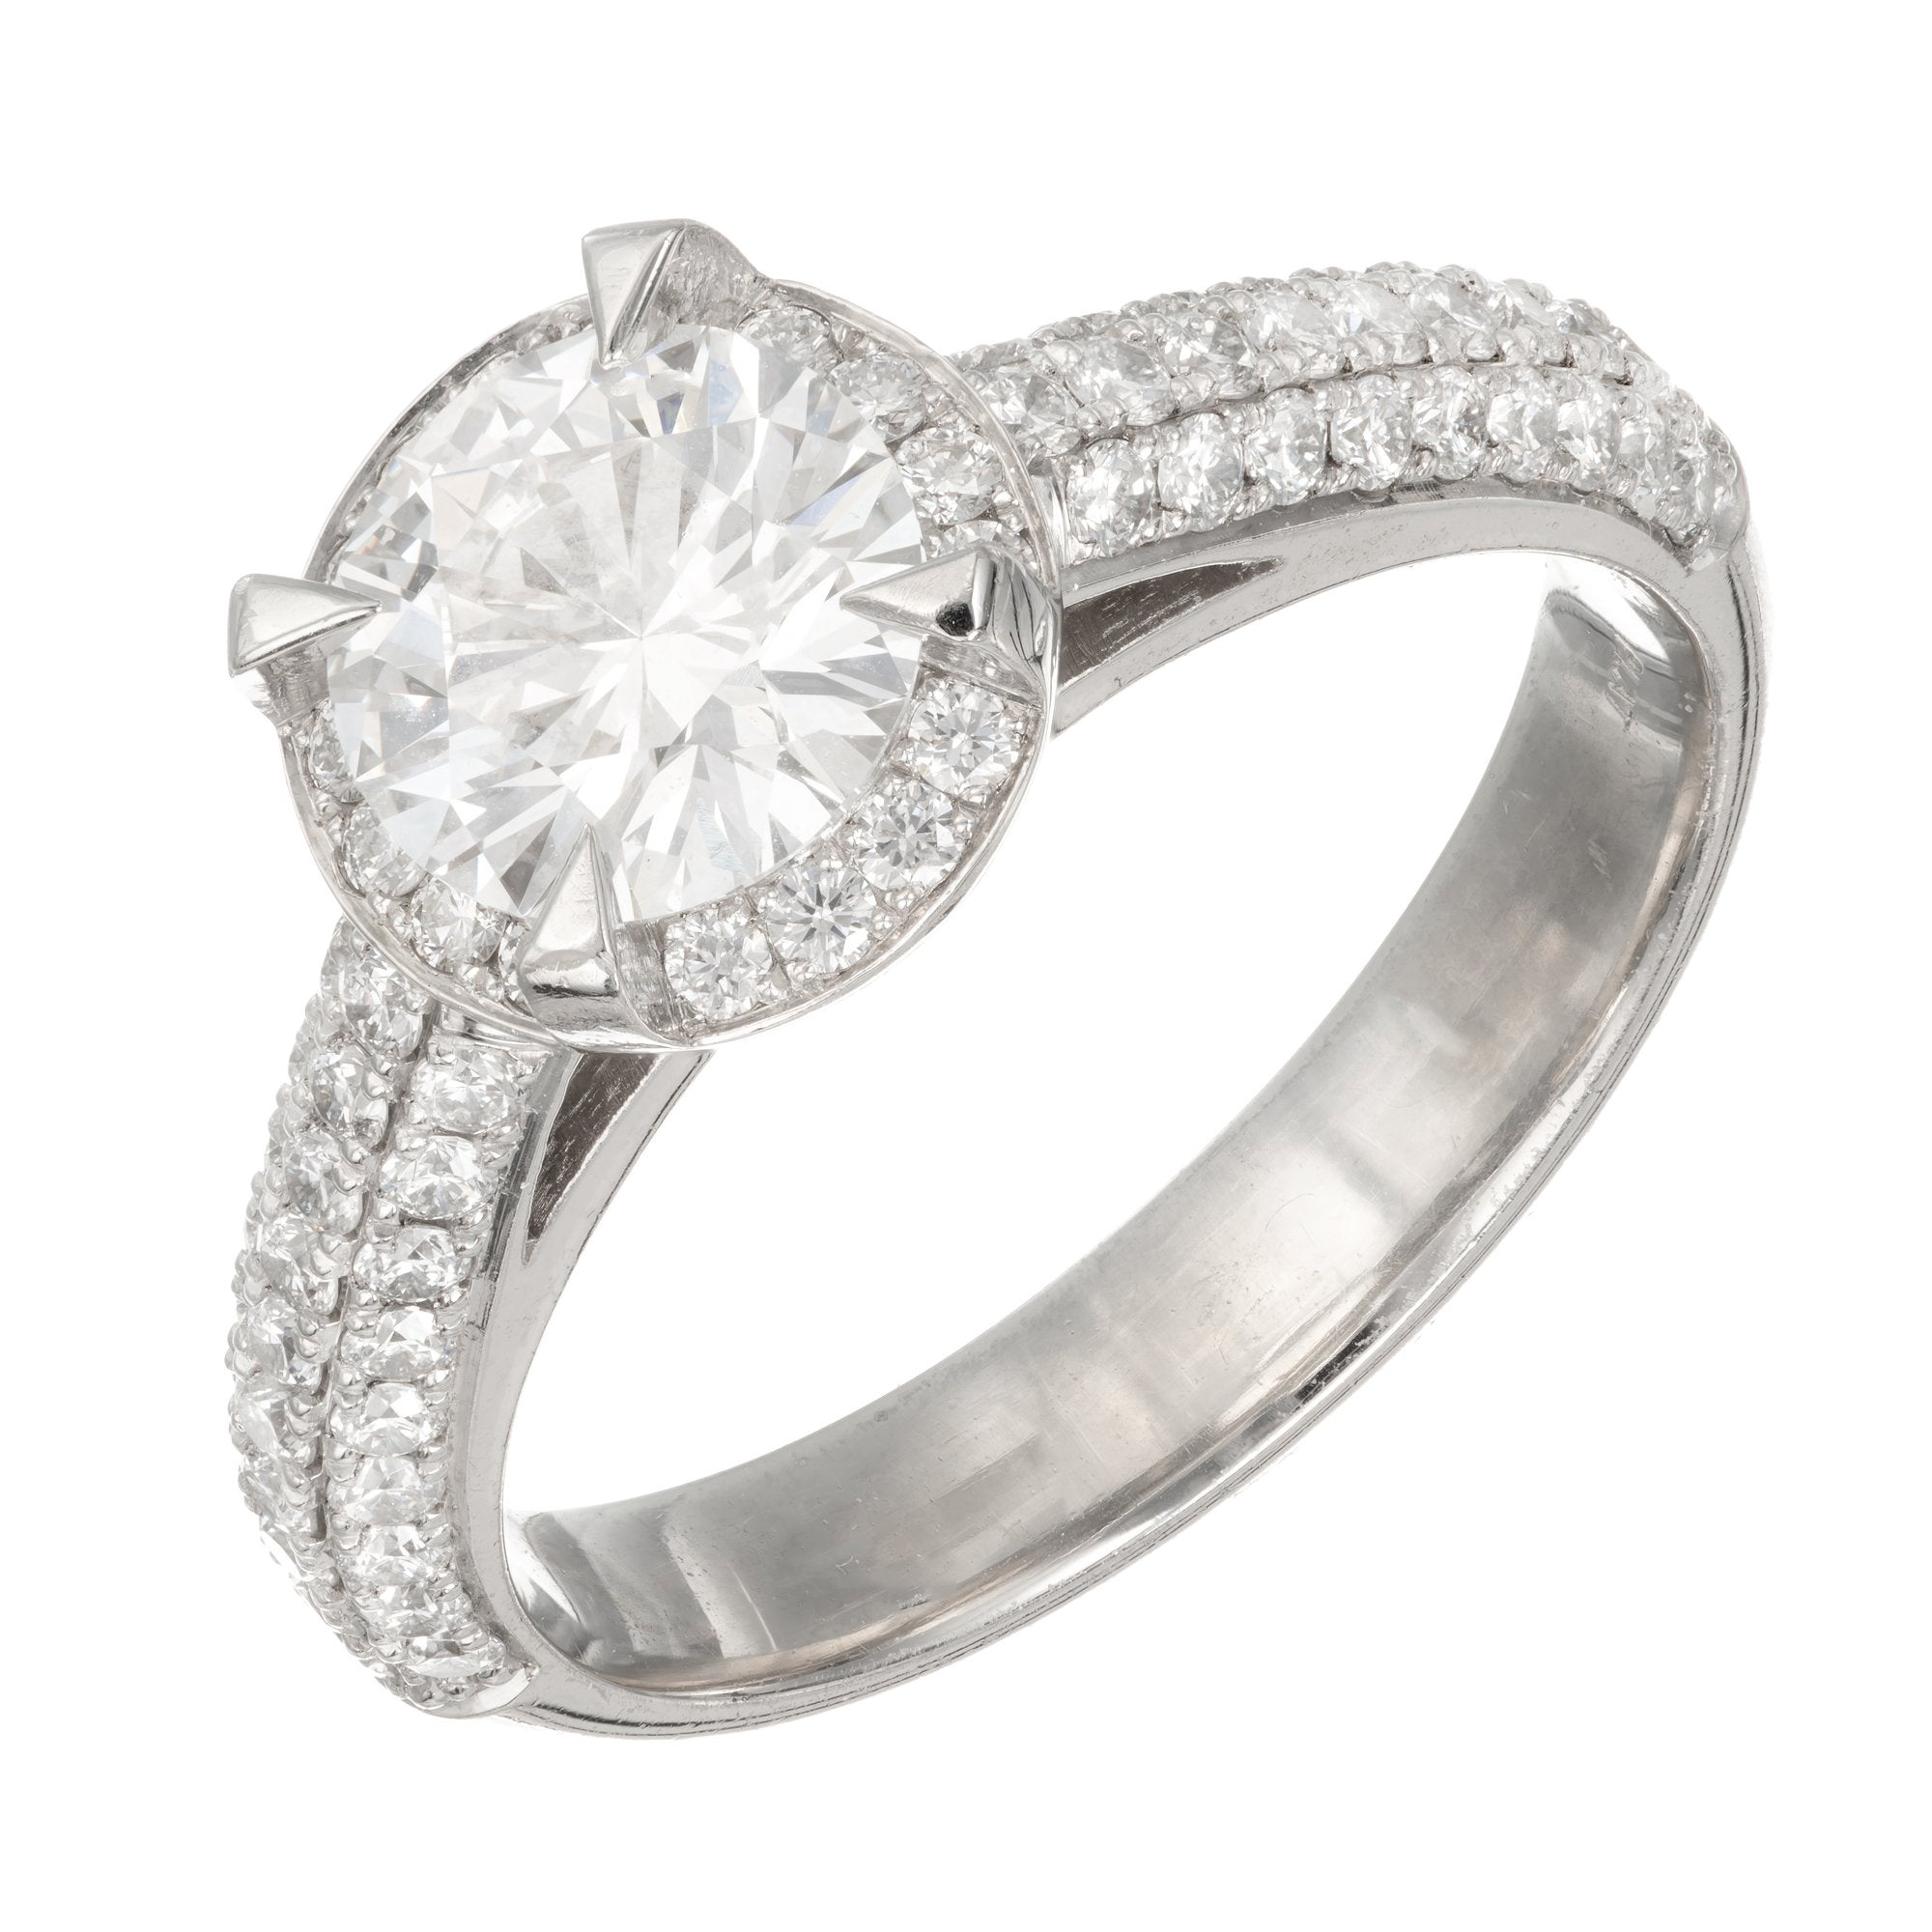 Peter Suchy GIA Certified 1.22 Carat Diamond Platinum Halo Engagement Ring